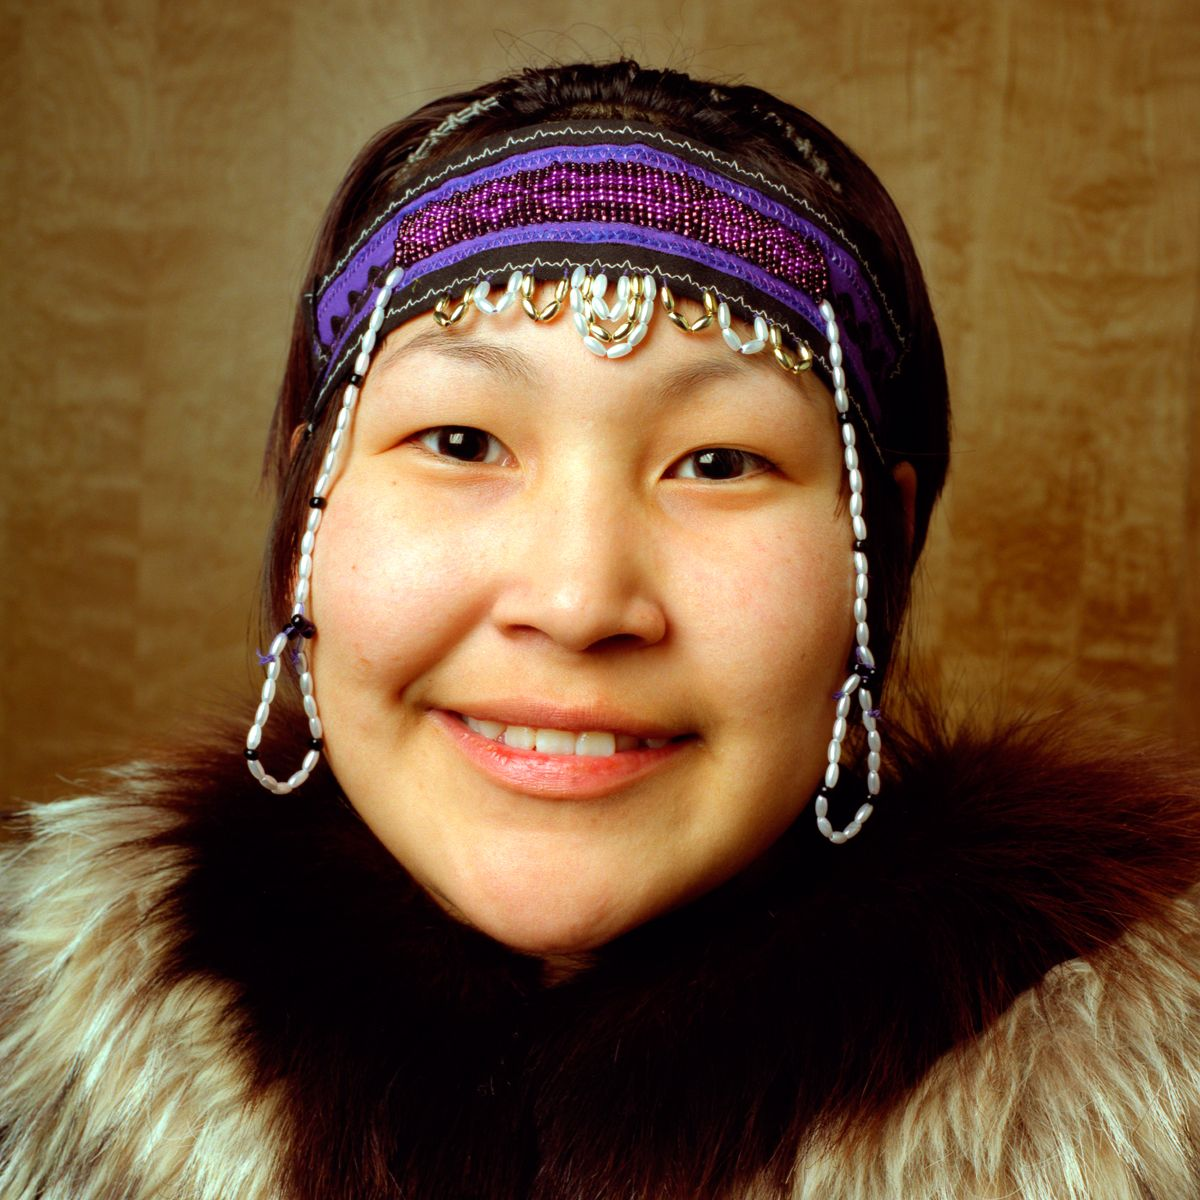 Portrait, Cambridge Bay, Nunavut, Location photographer